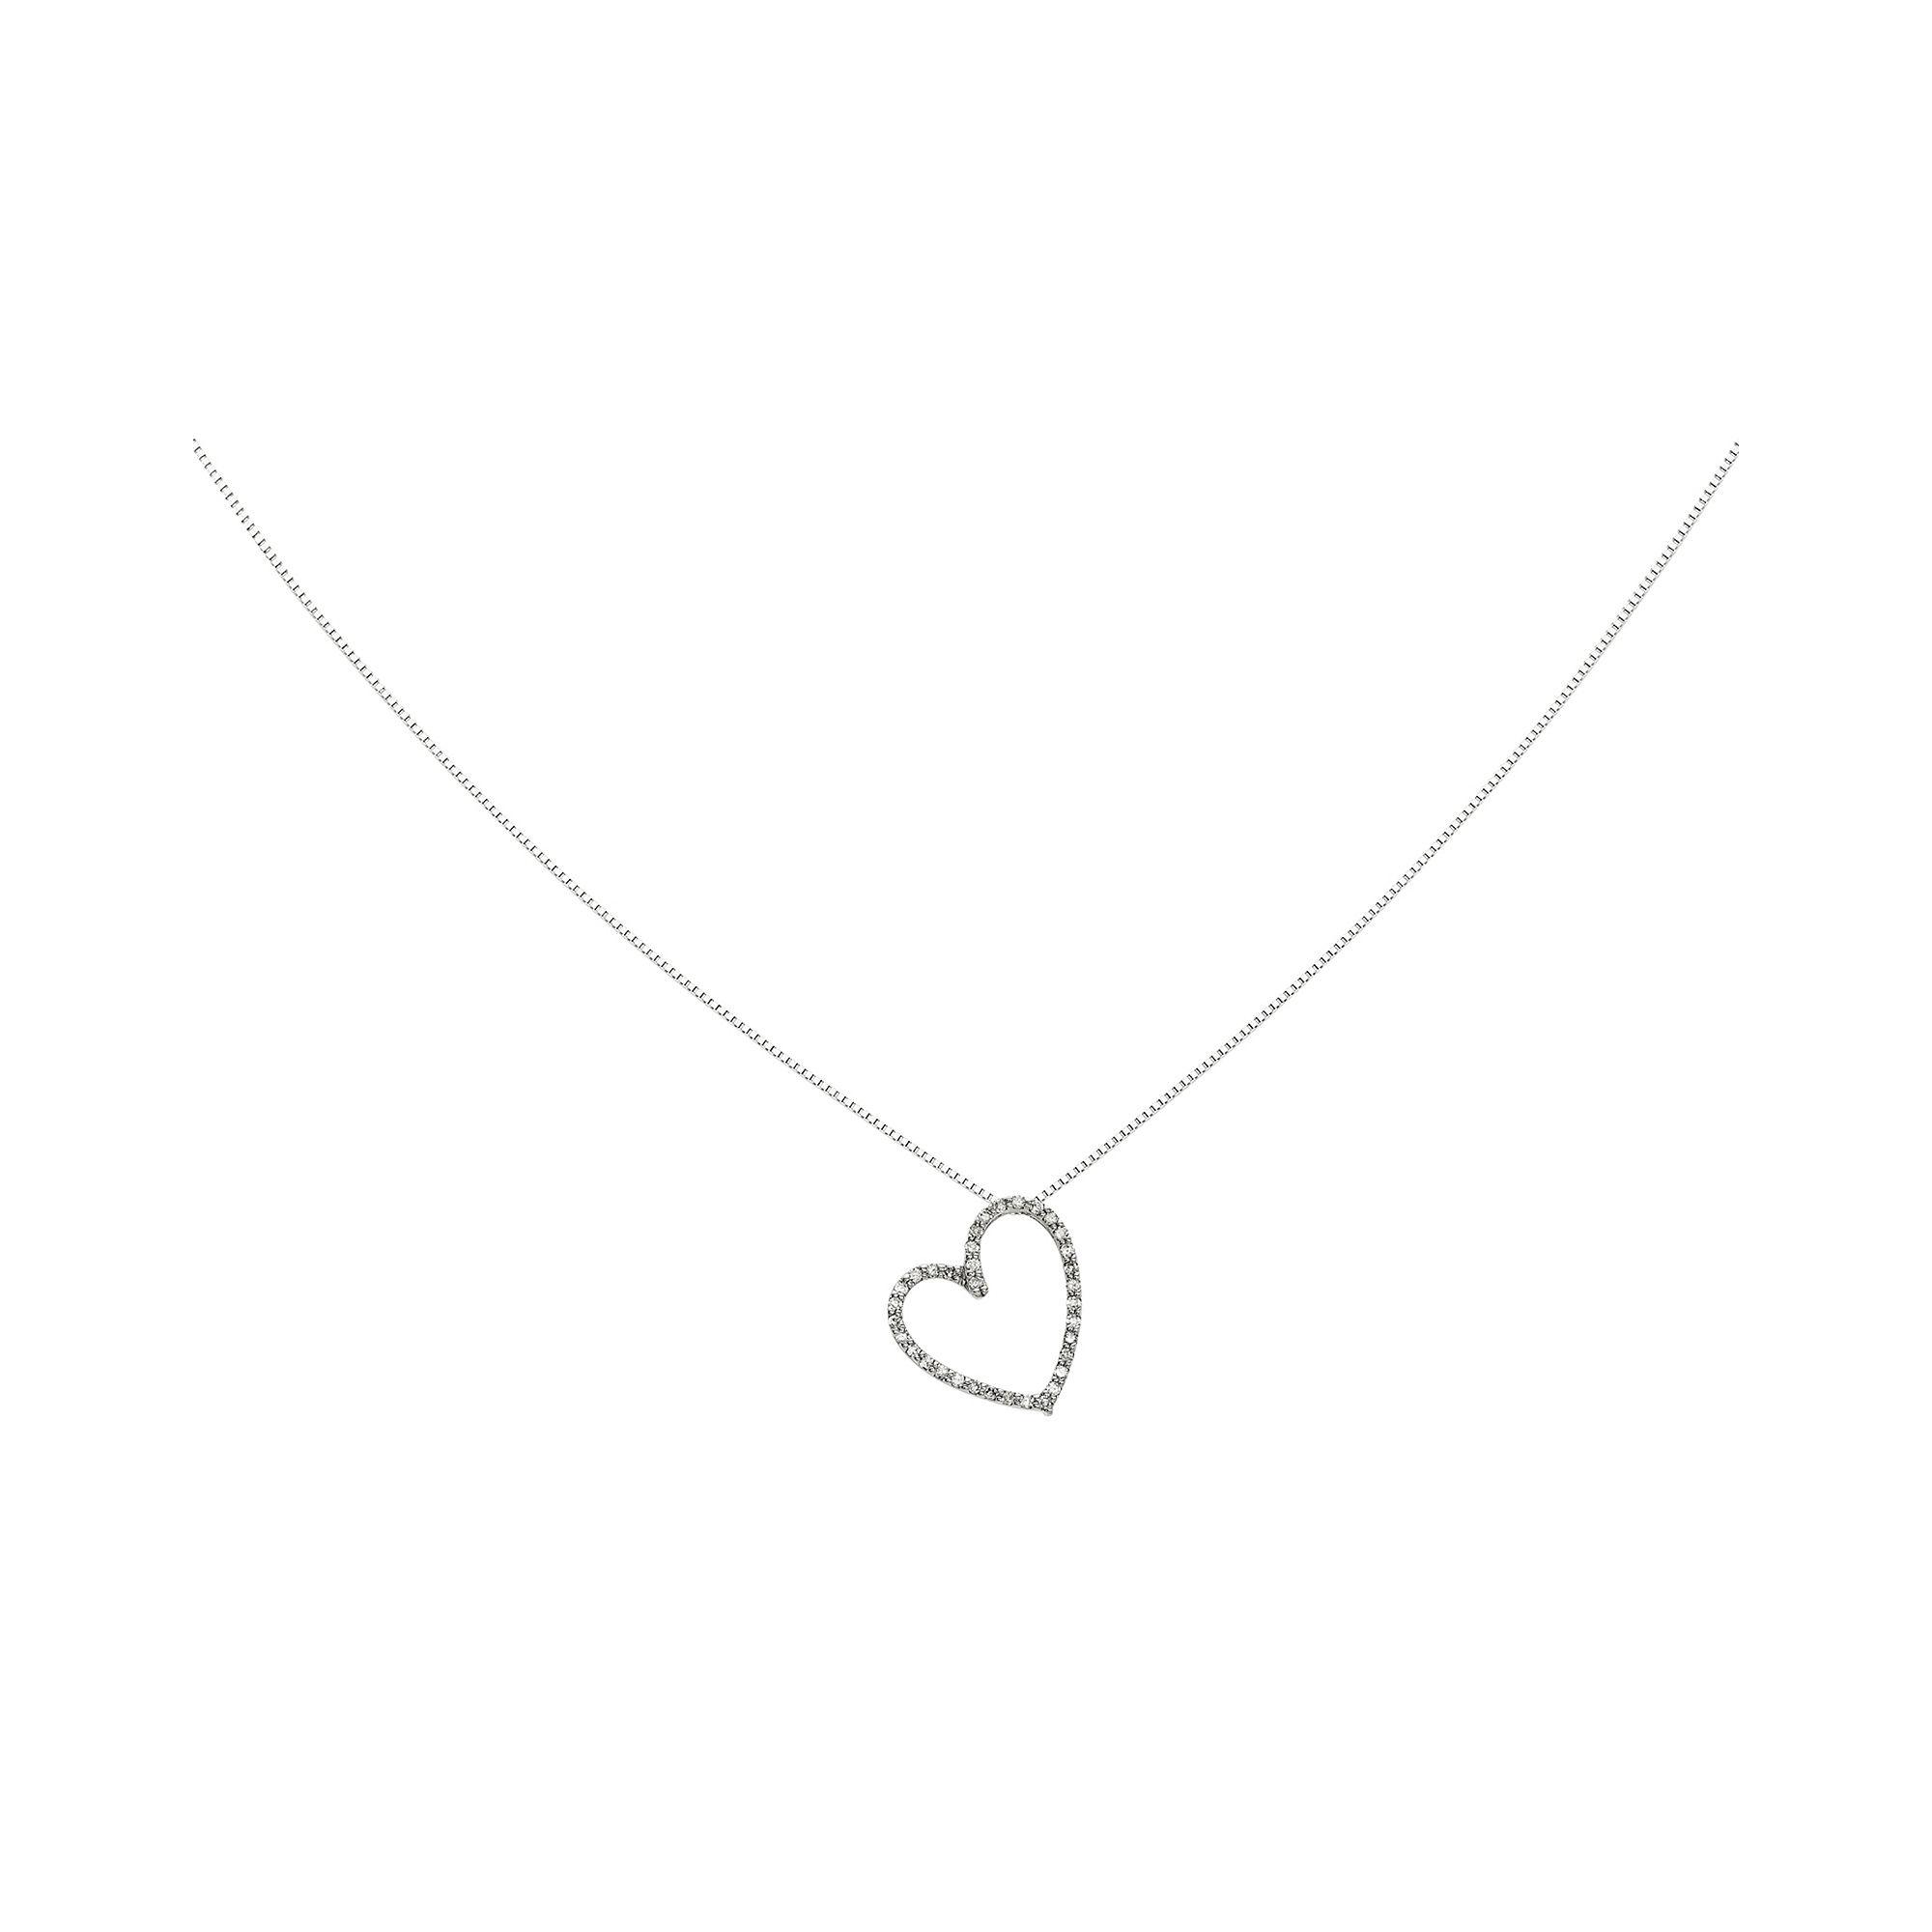 1/10 CT. T.W. Diamond 14K White Gold Vintage Heart Pendant Necklace